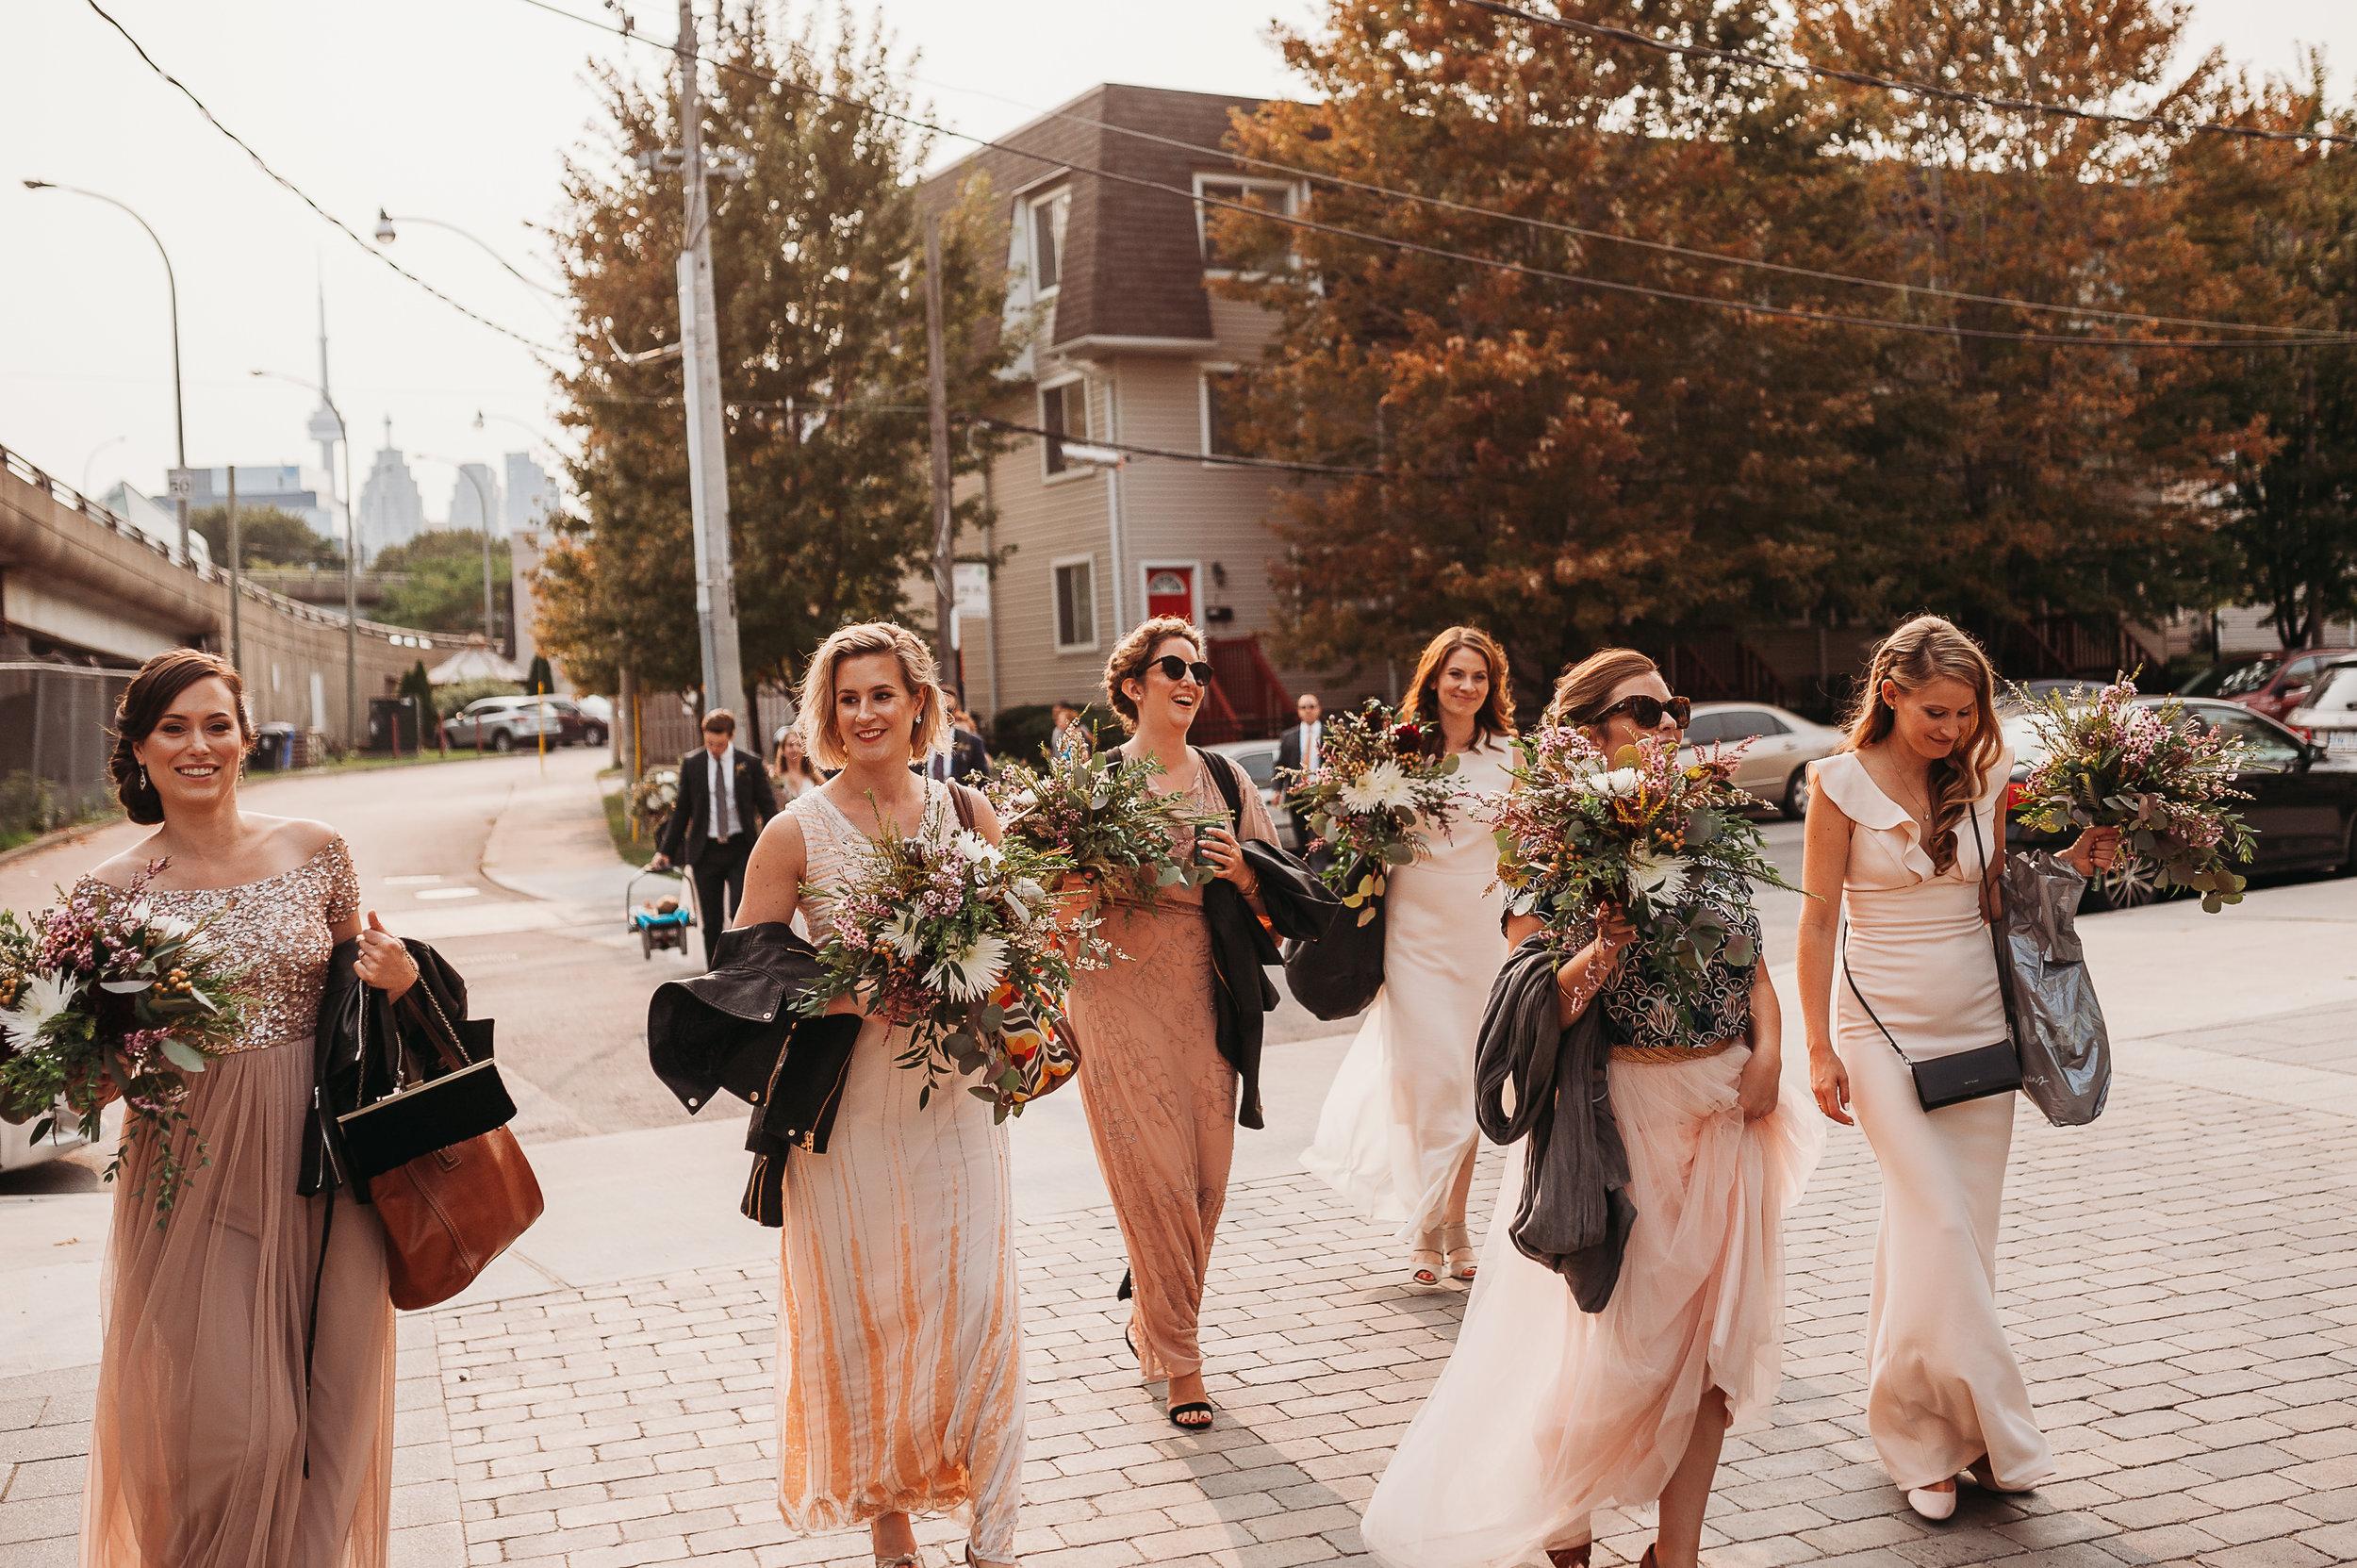 bridal-party-walking-to-portraits-toronto-rustic-boho-airship37-wedding-by-willow-birch-photo-toronto-documentary-wedding-photographers.jpg